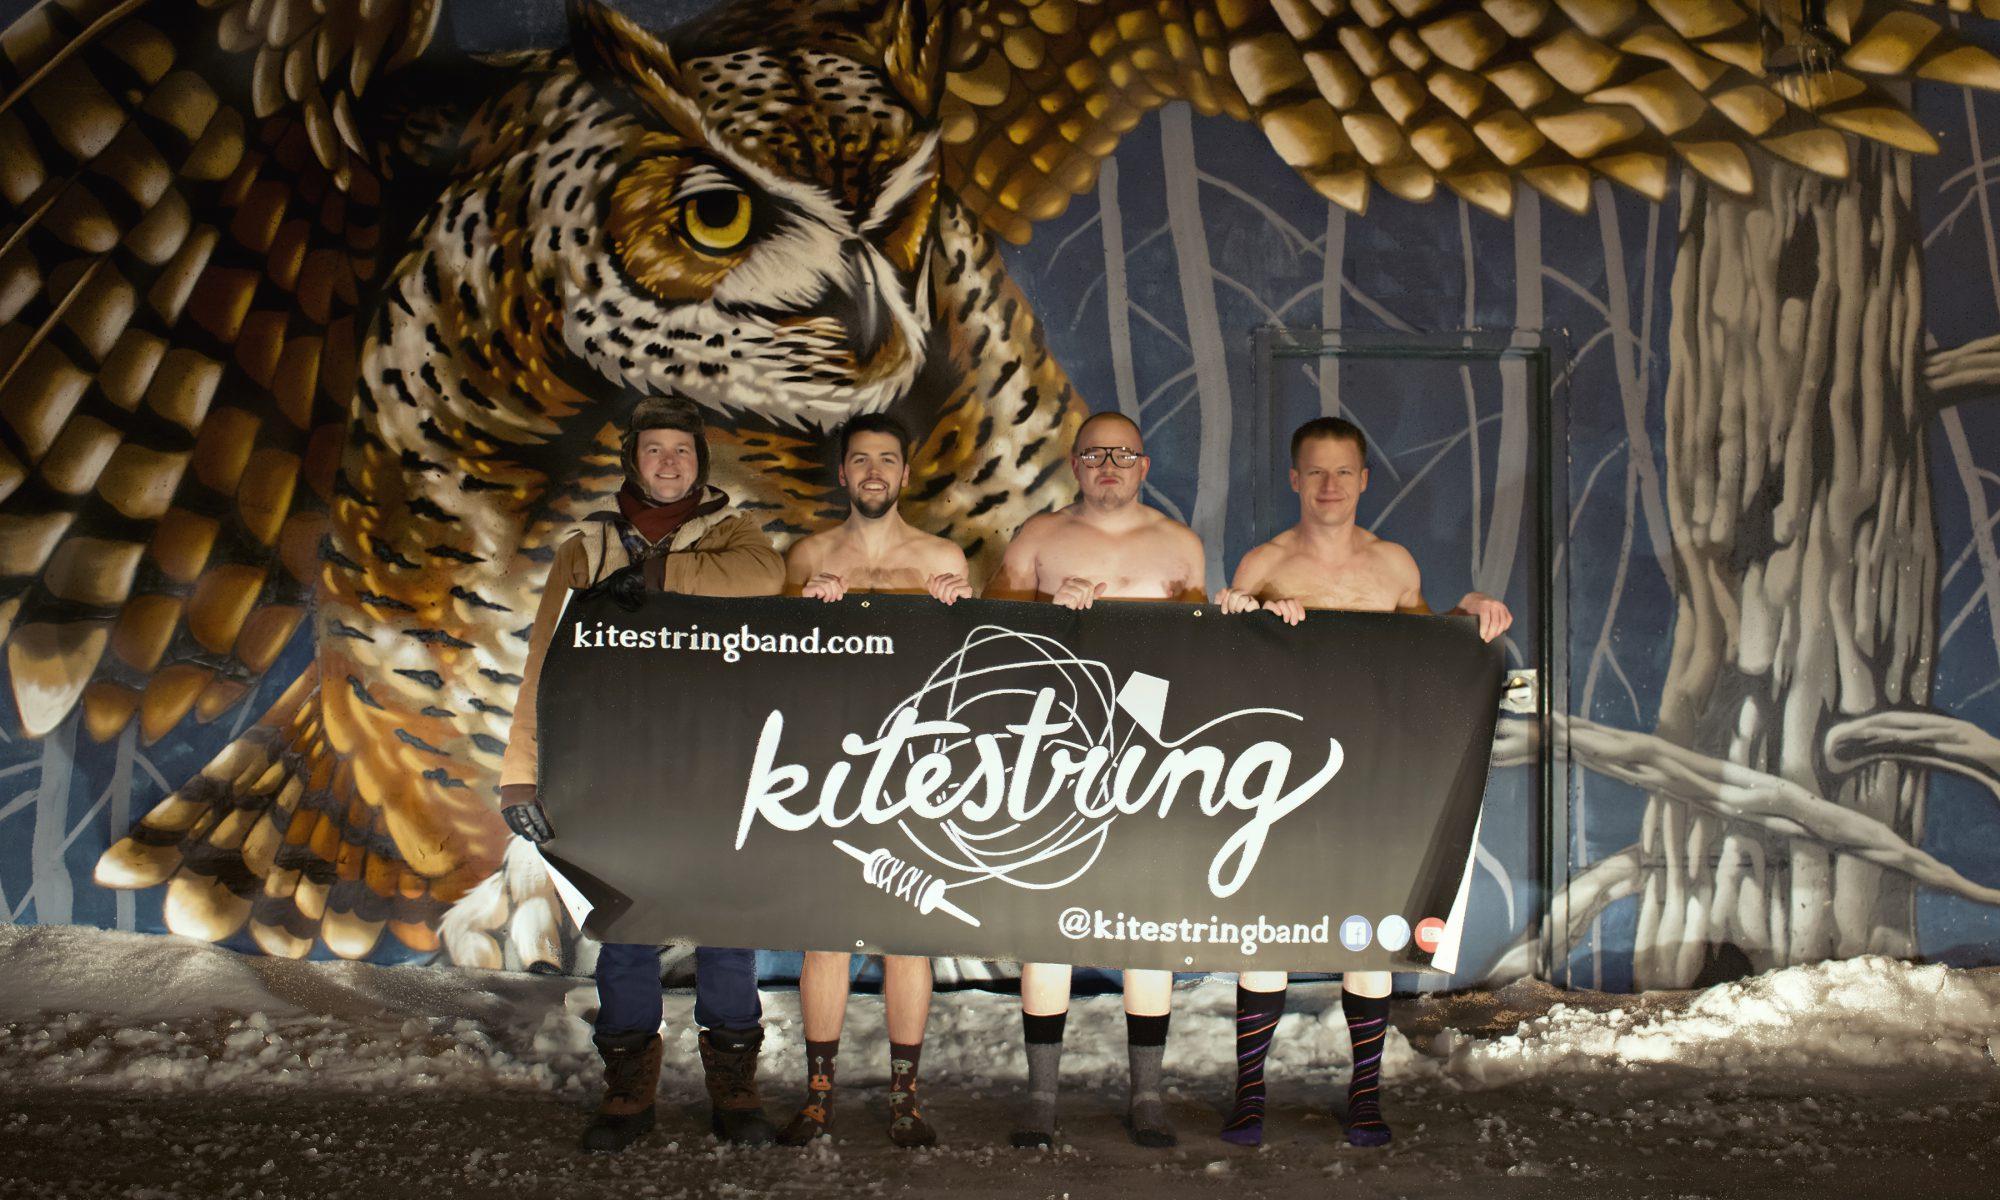 Kitestring